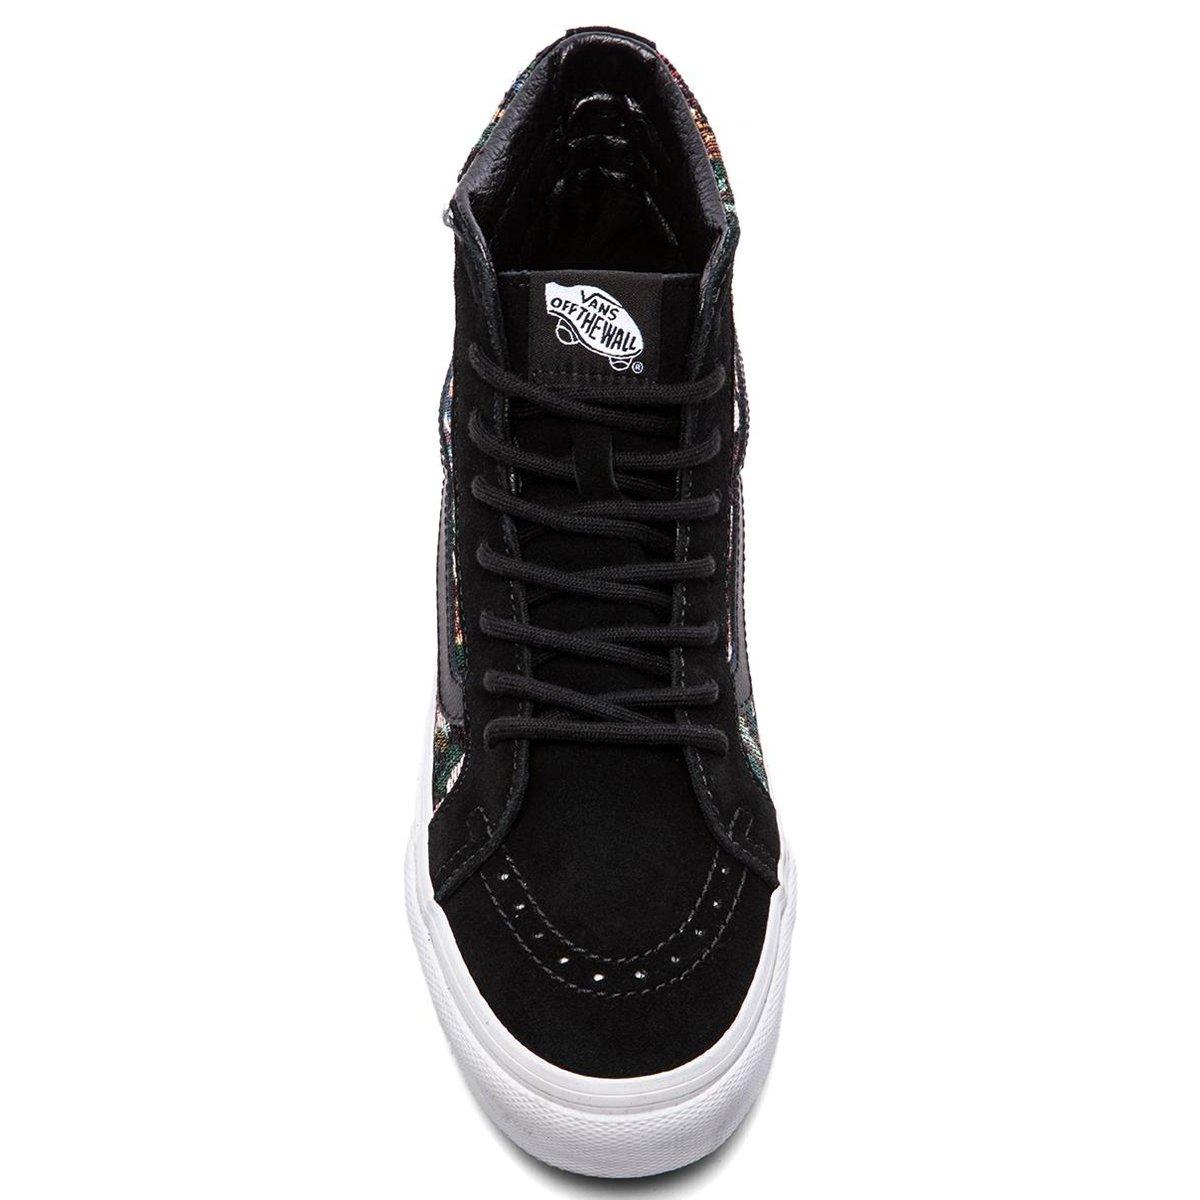 0093b9bfa3 Vans - Unisex Sk8-Hi Slim Shoes in (Tapestry Floral) Black